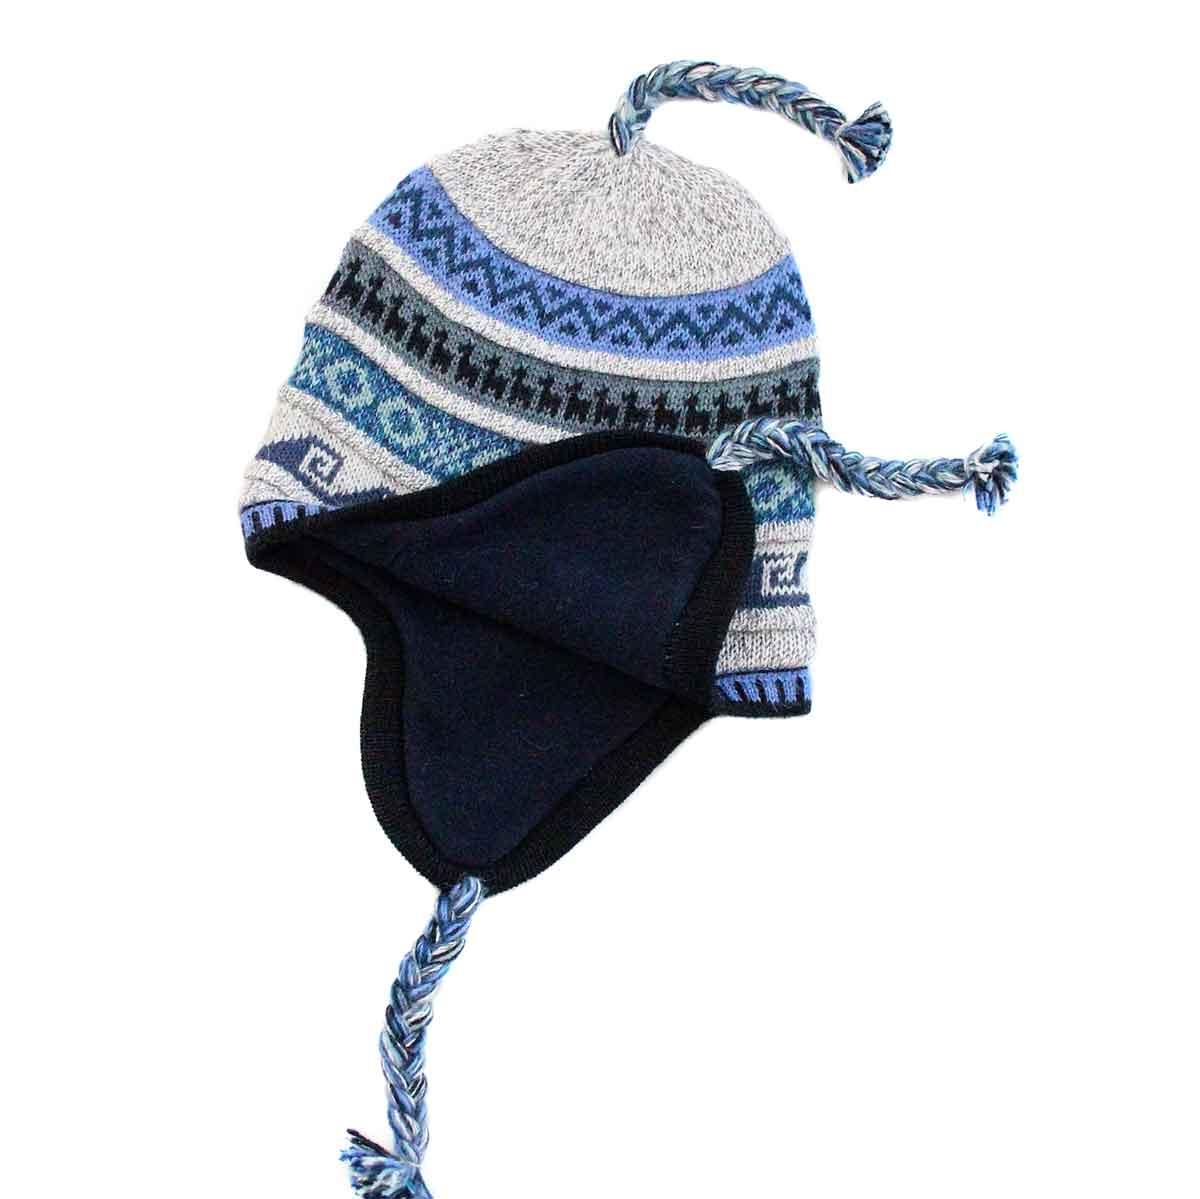 Inka-Products-Bonnet Péruvien Chullo-Alpaga Gris Clair Ethnique-2